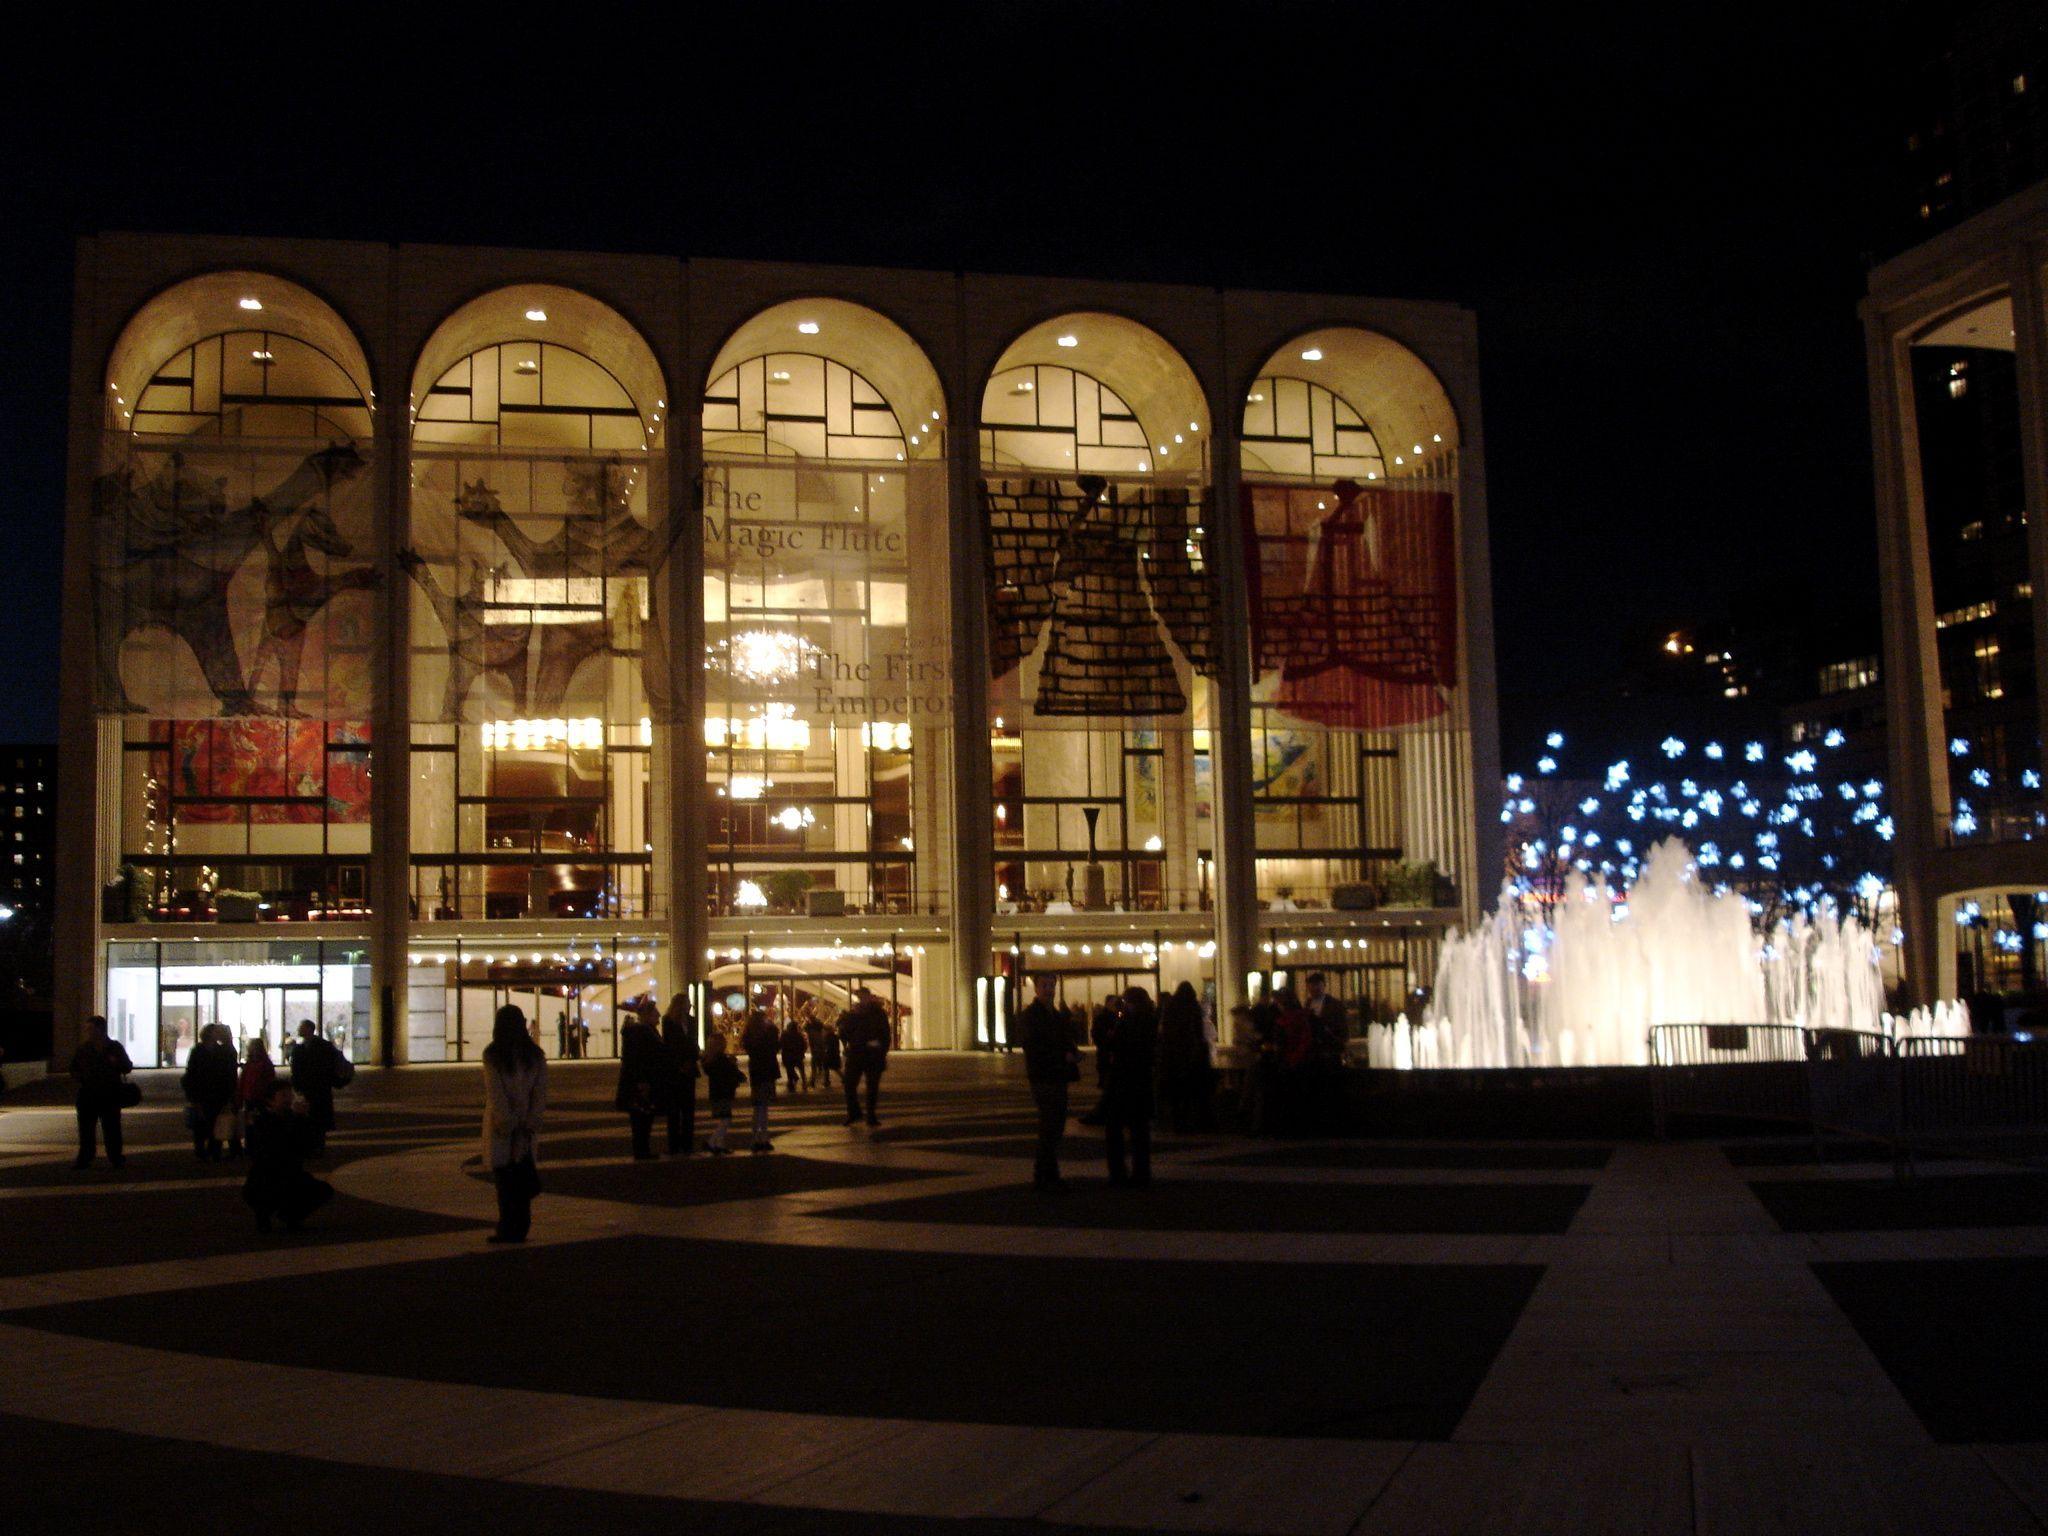 Metropolitan_Opera_House, NYC